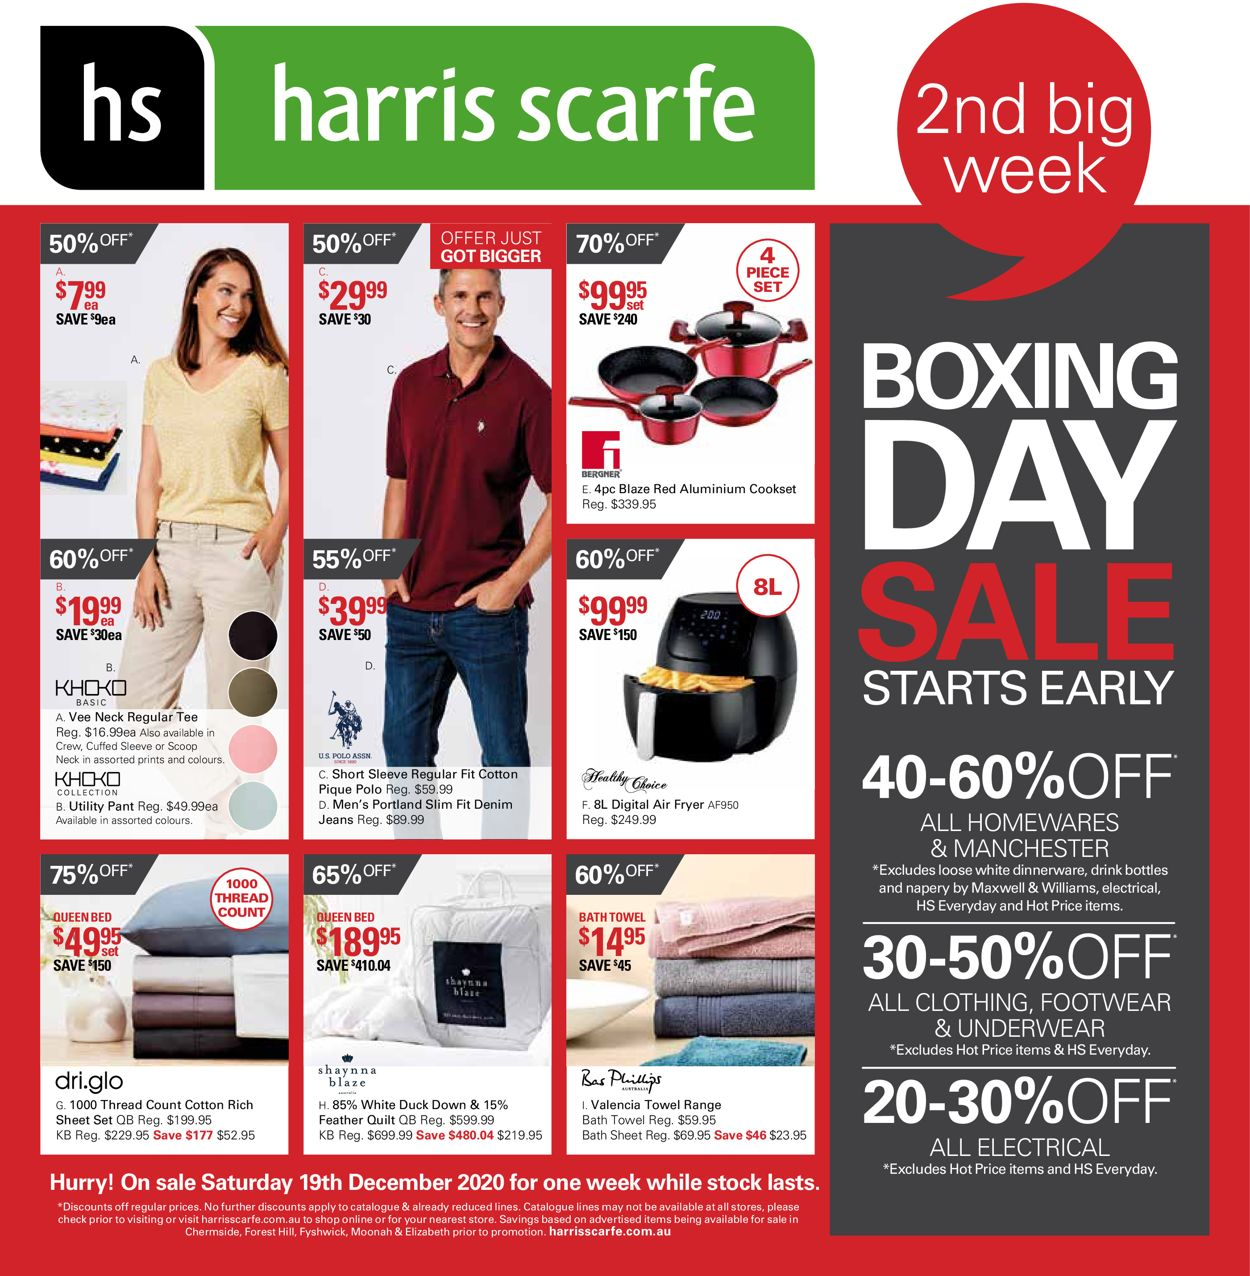 Harris Scarfe - Boxing Day 2020 Catalogue - 19/12-25/12/2020